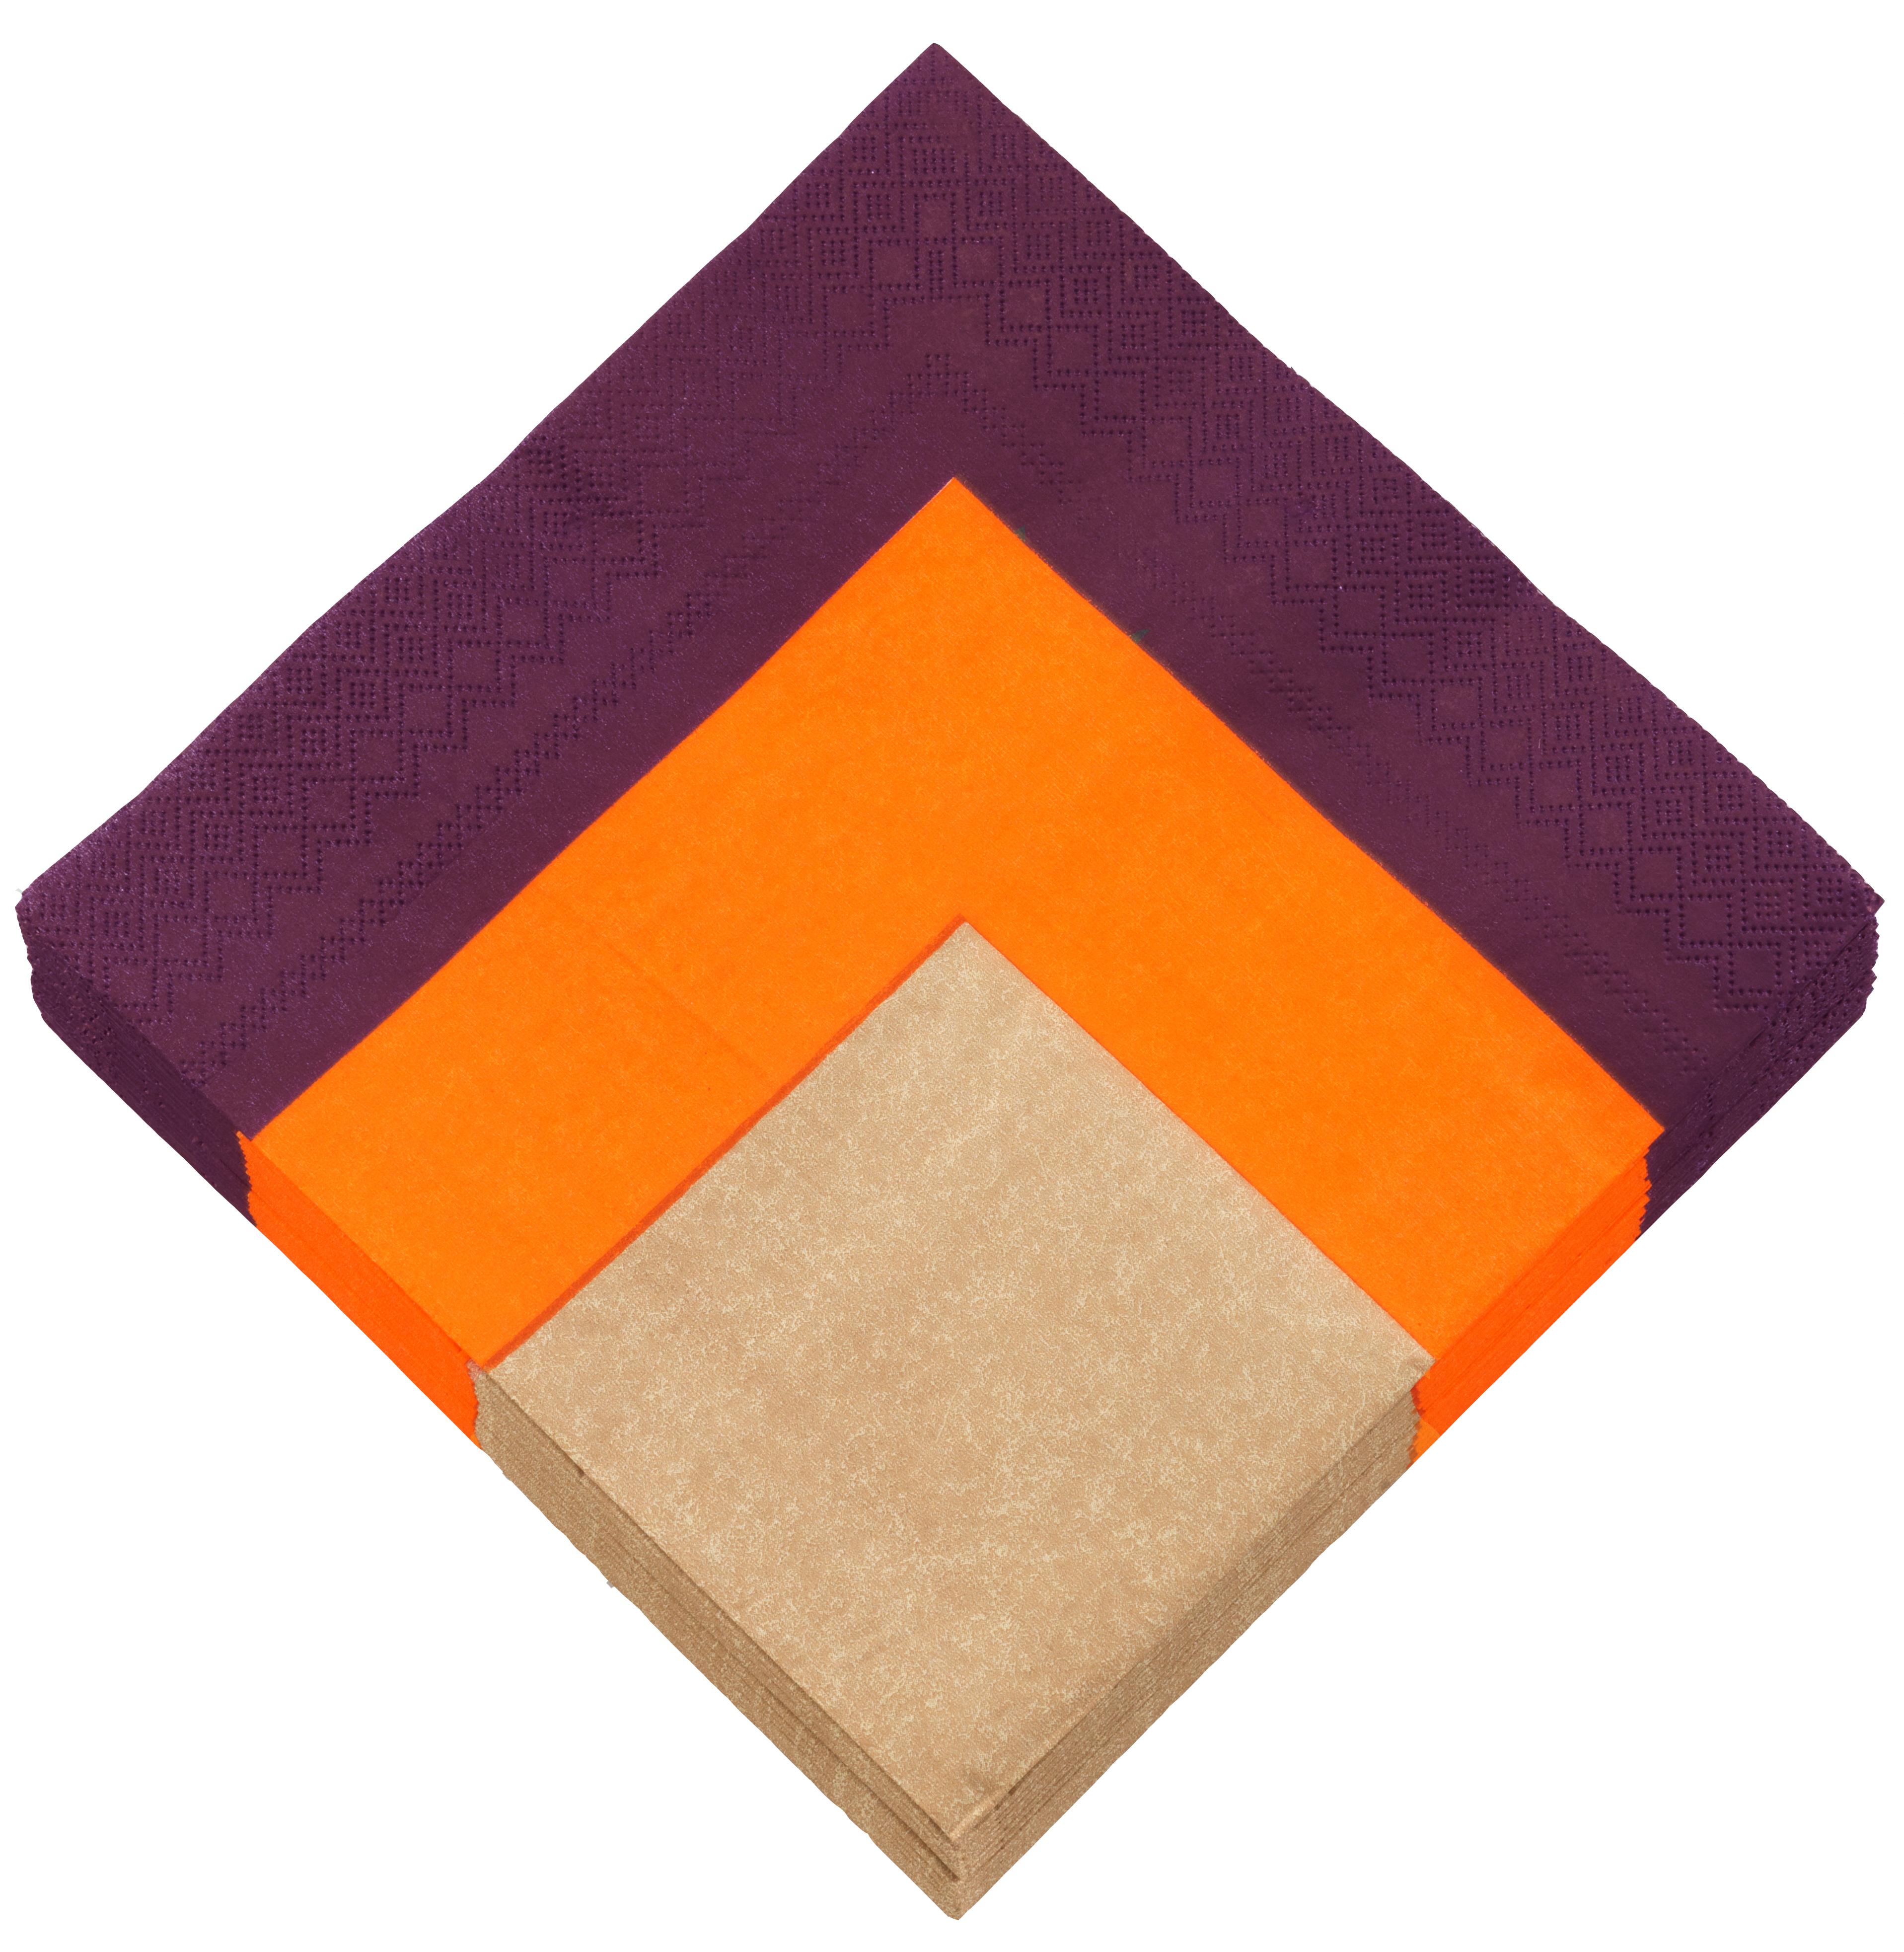 dinner serviette aubergine mandarine sahara daff filz. Black Bedroom Furniture Sets. Home Design Ideas